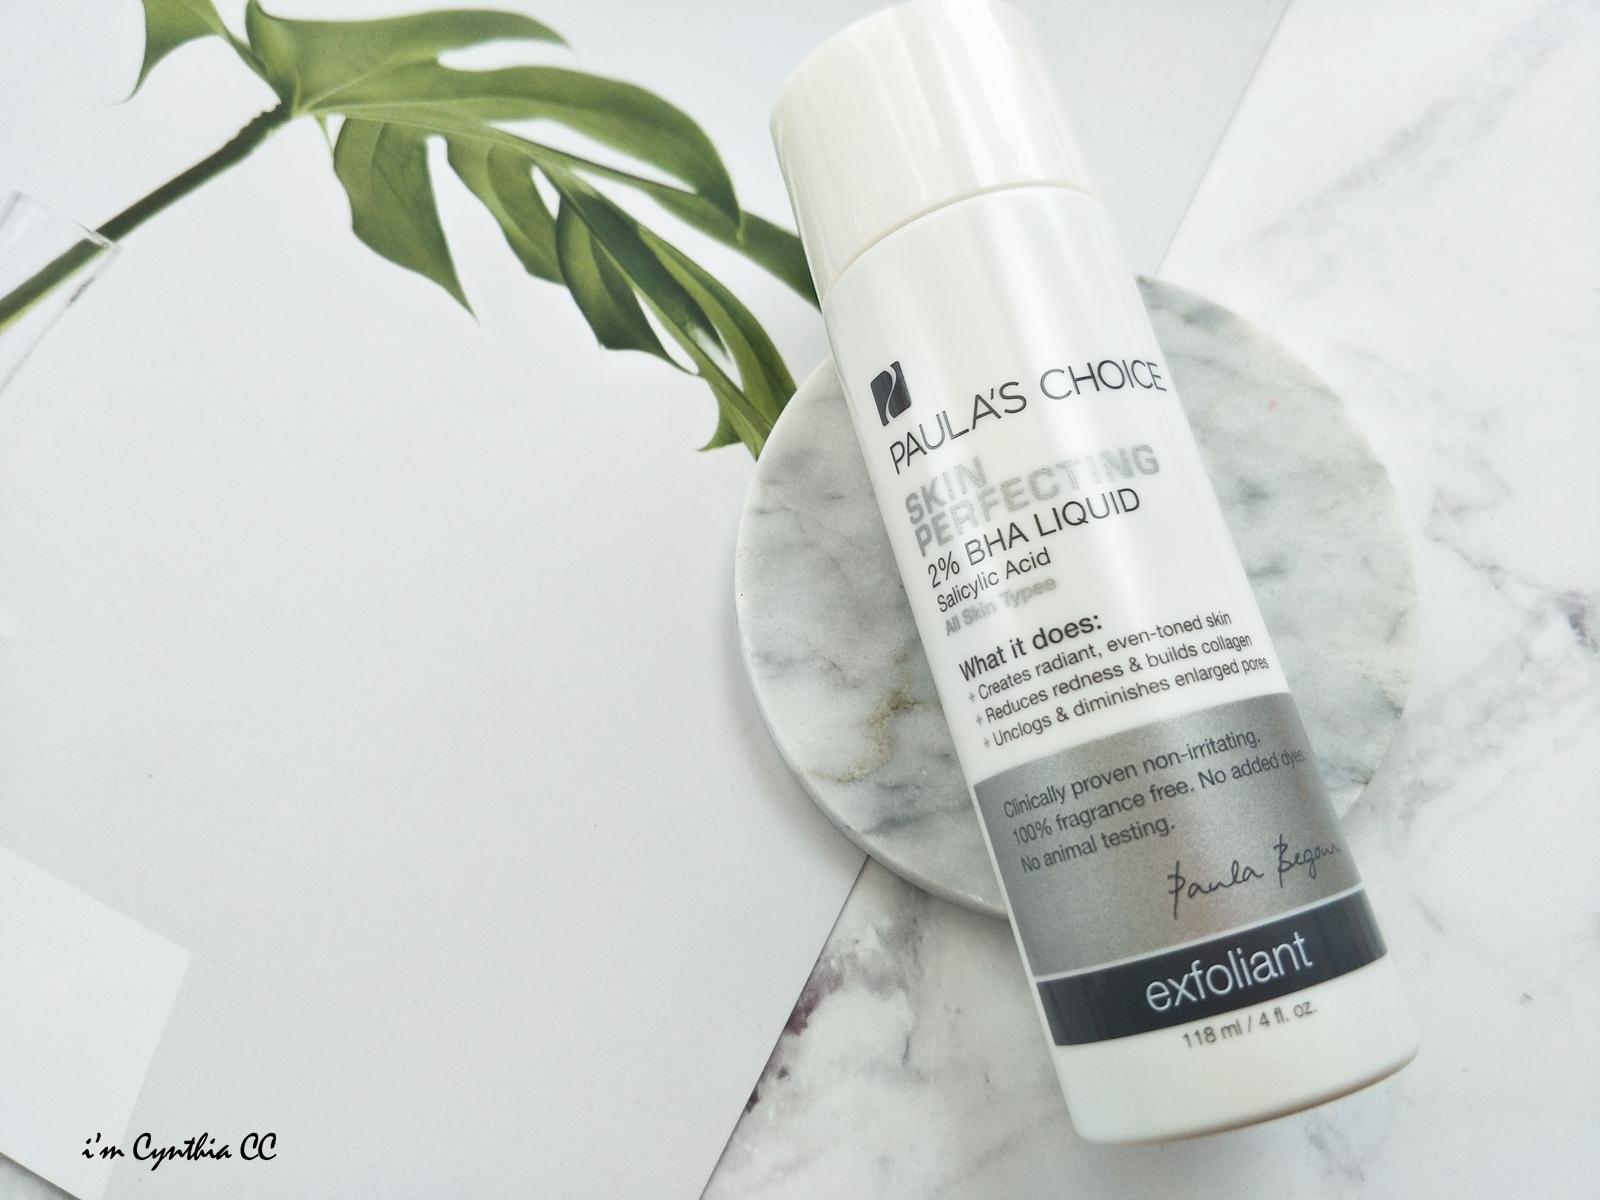 paula's choice寶拉珍選經典保養品2%水楊酸精華液